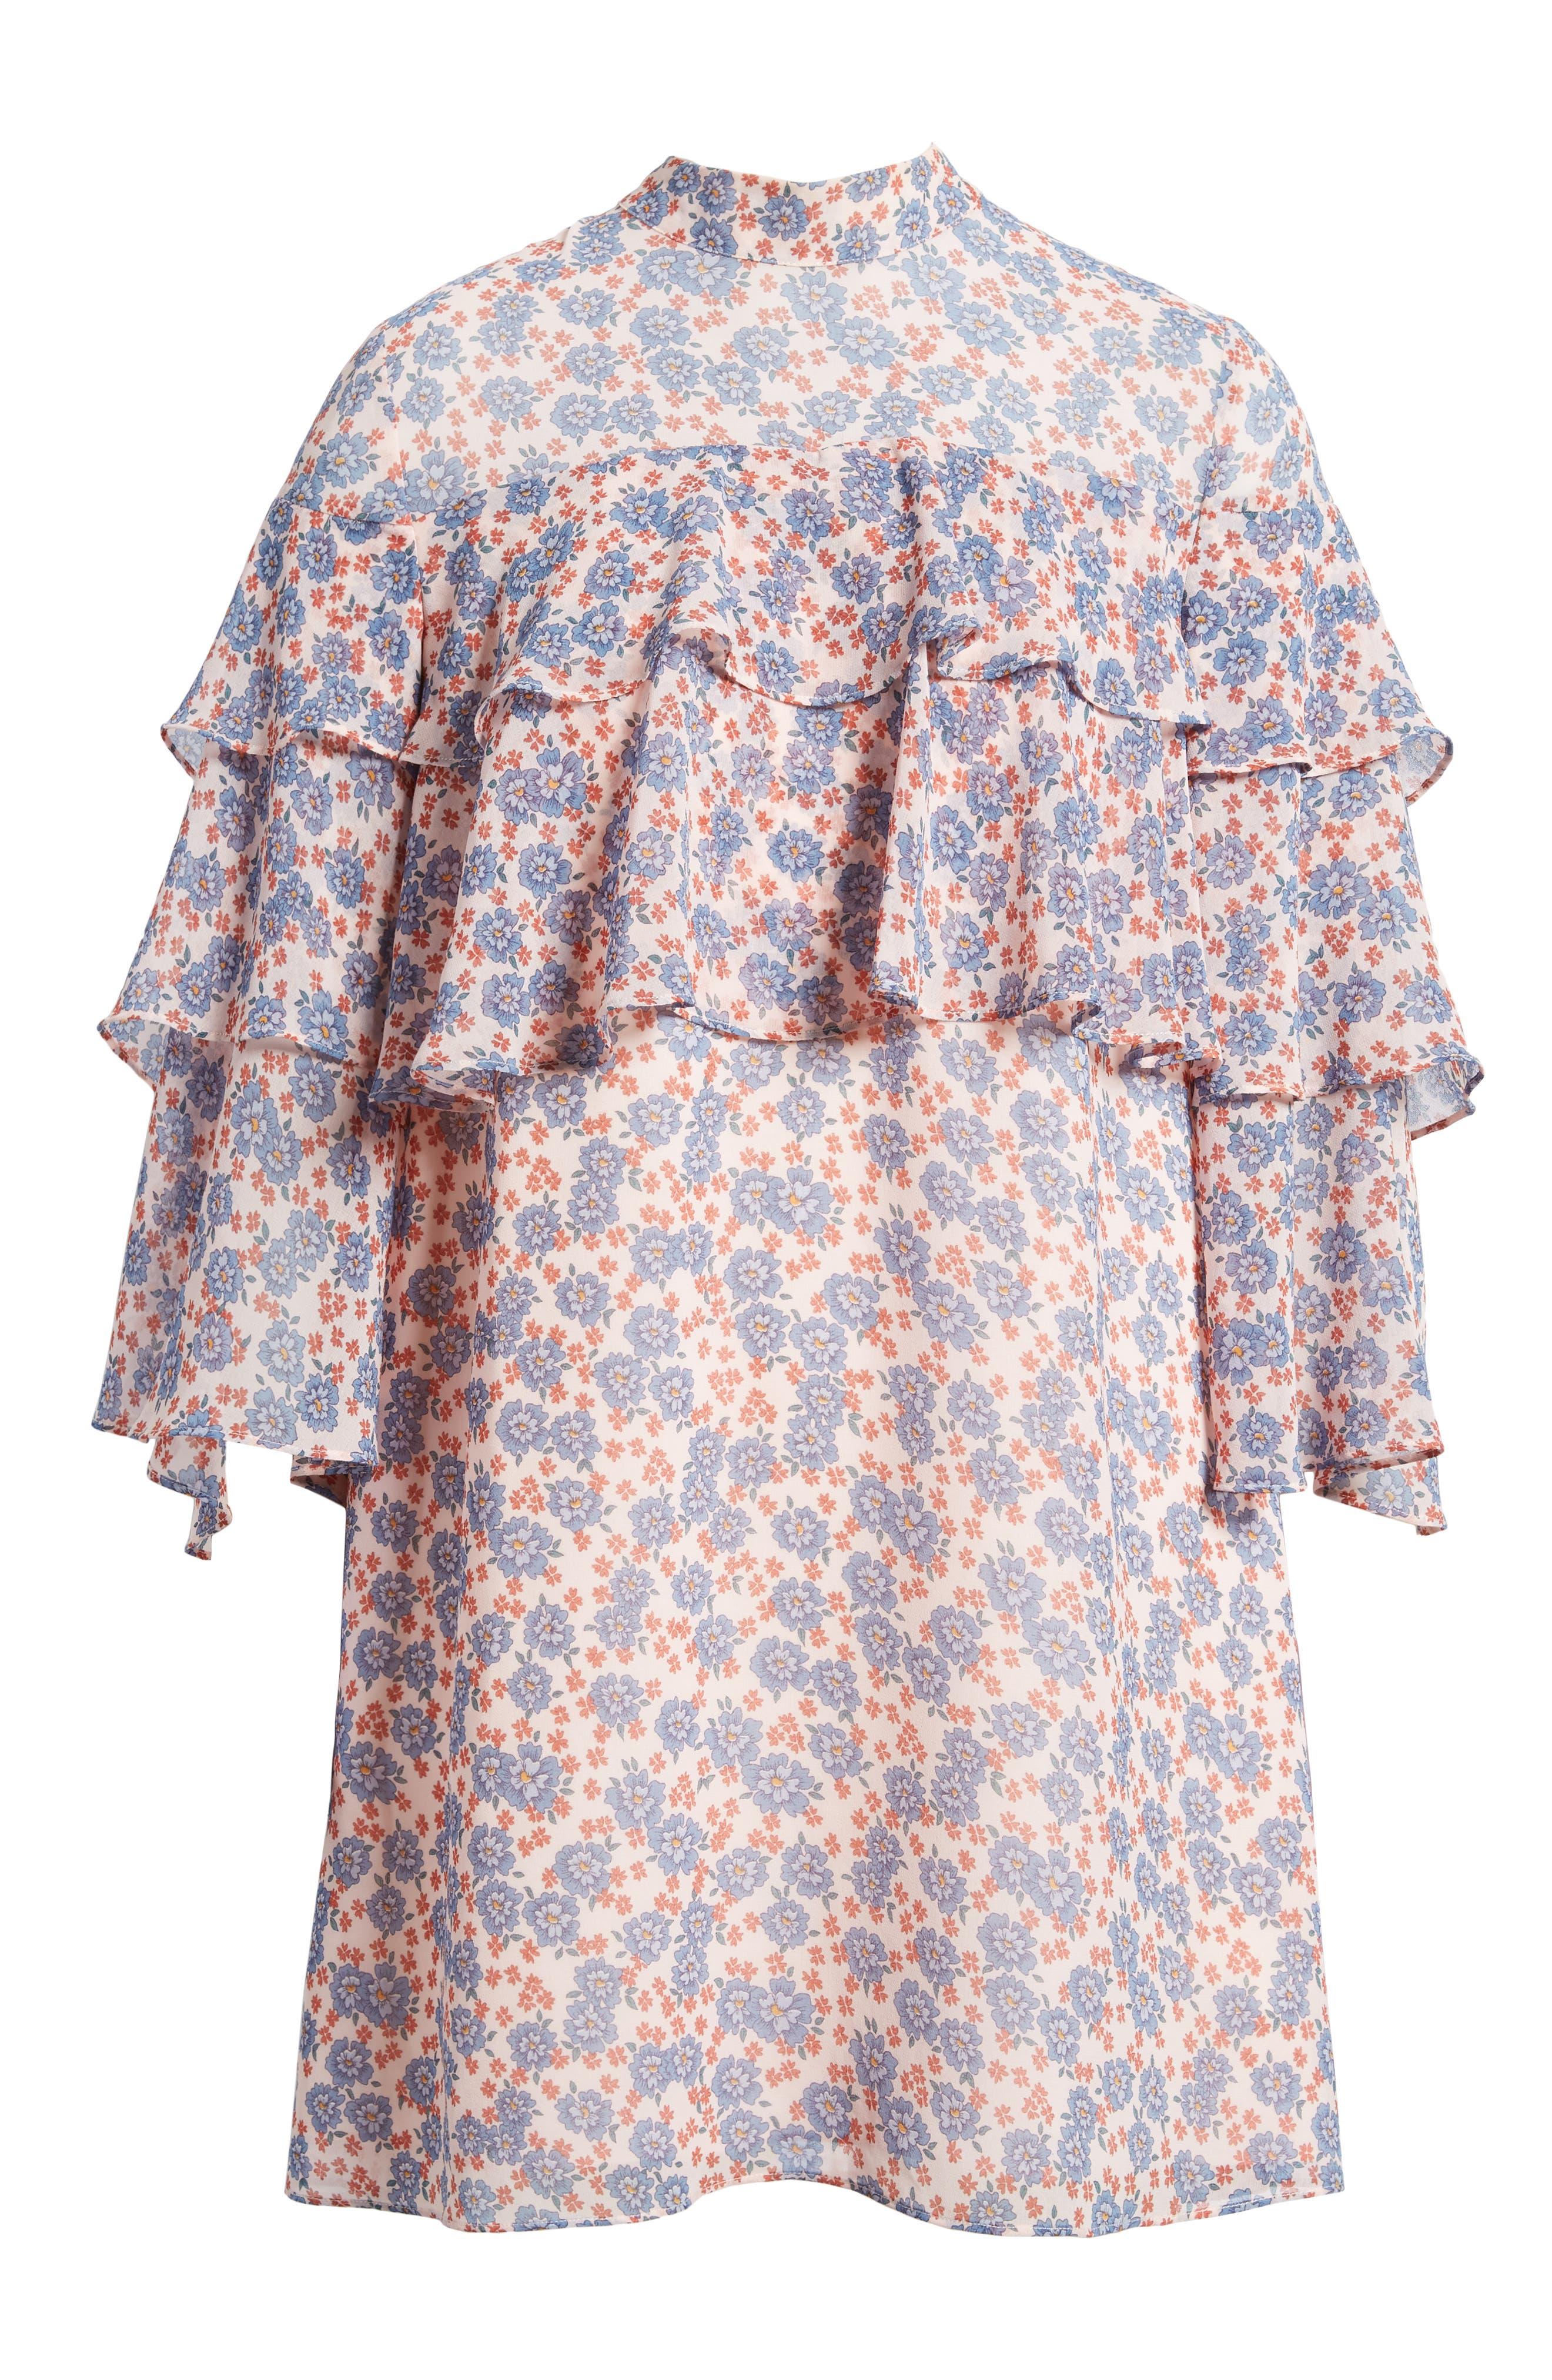 Darcy Ruffle Dress,                             Alternate thumbnail 6, color,                             Pink Multi